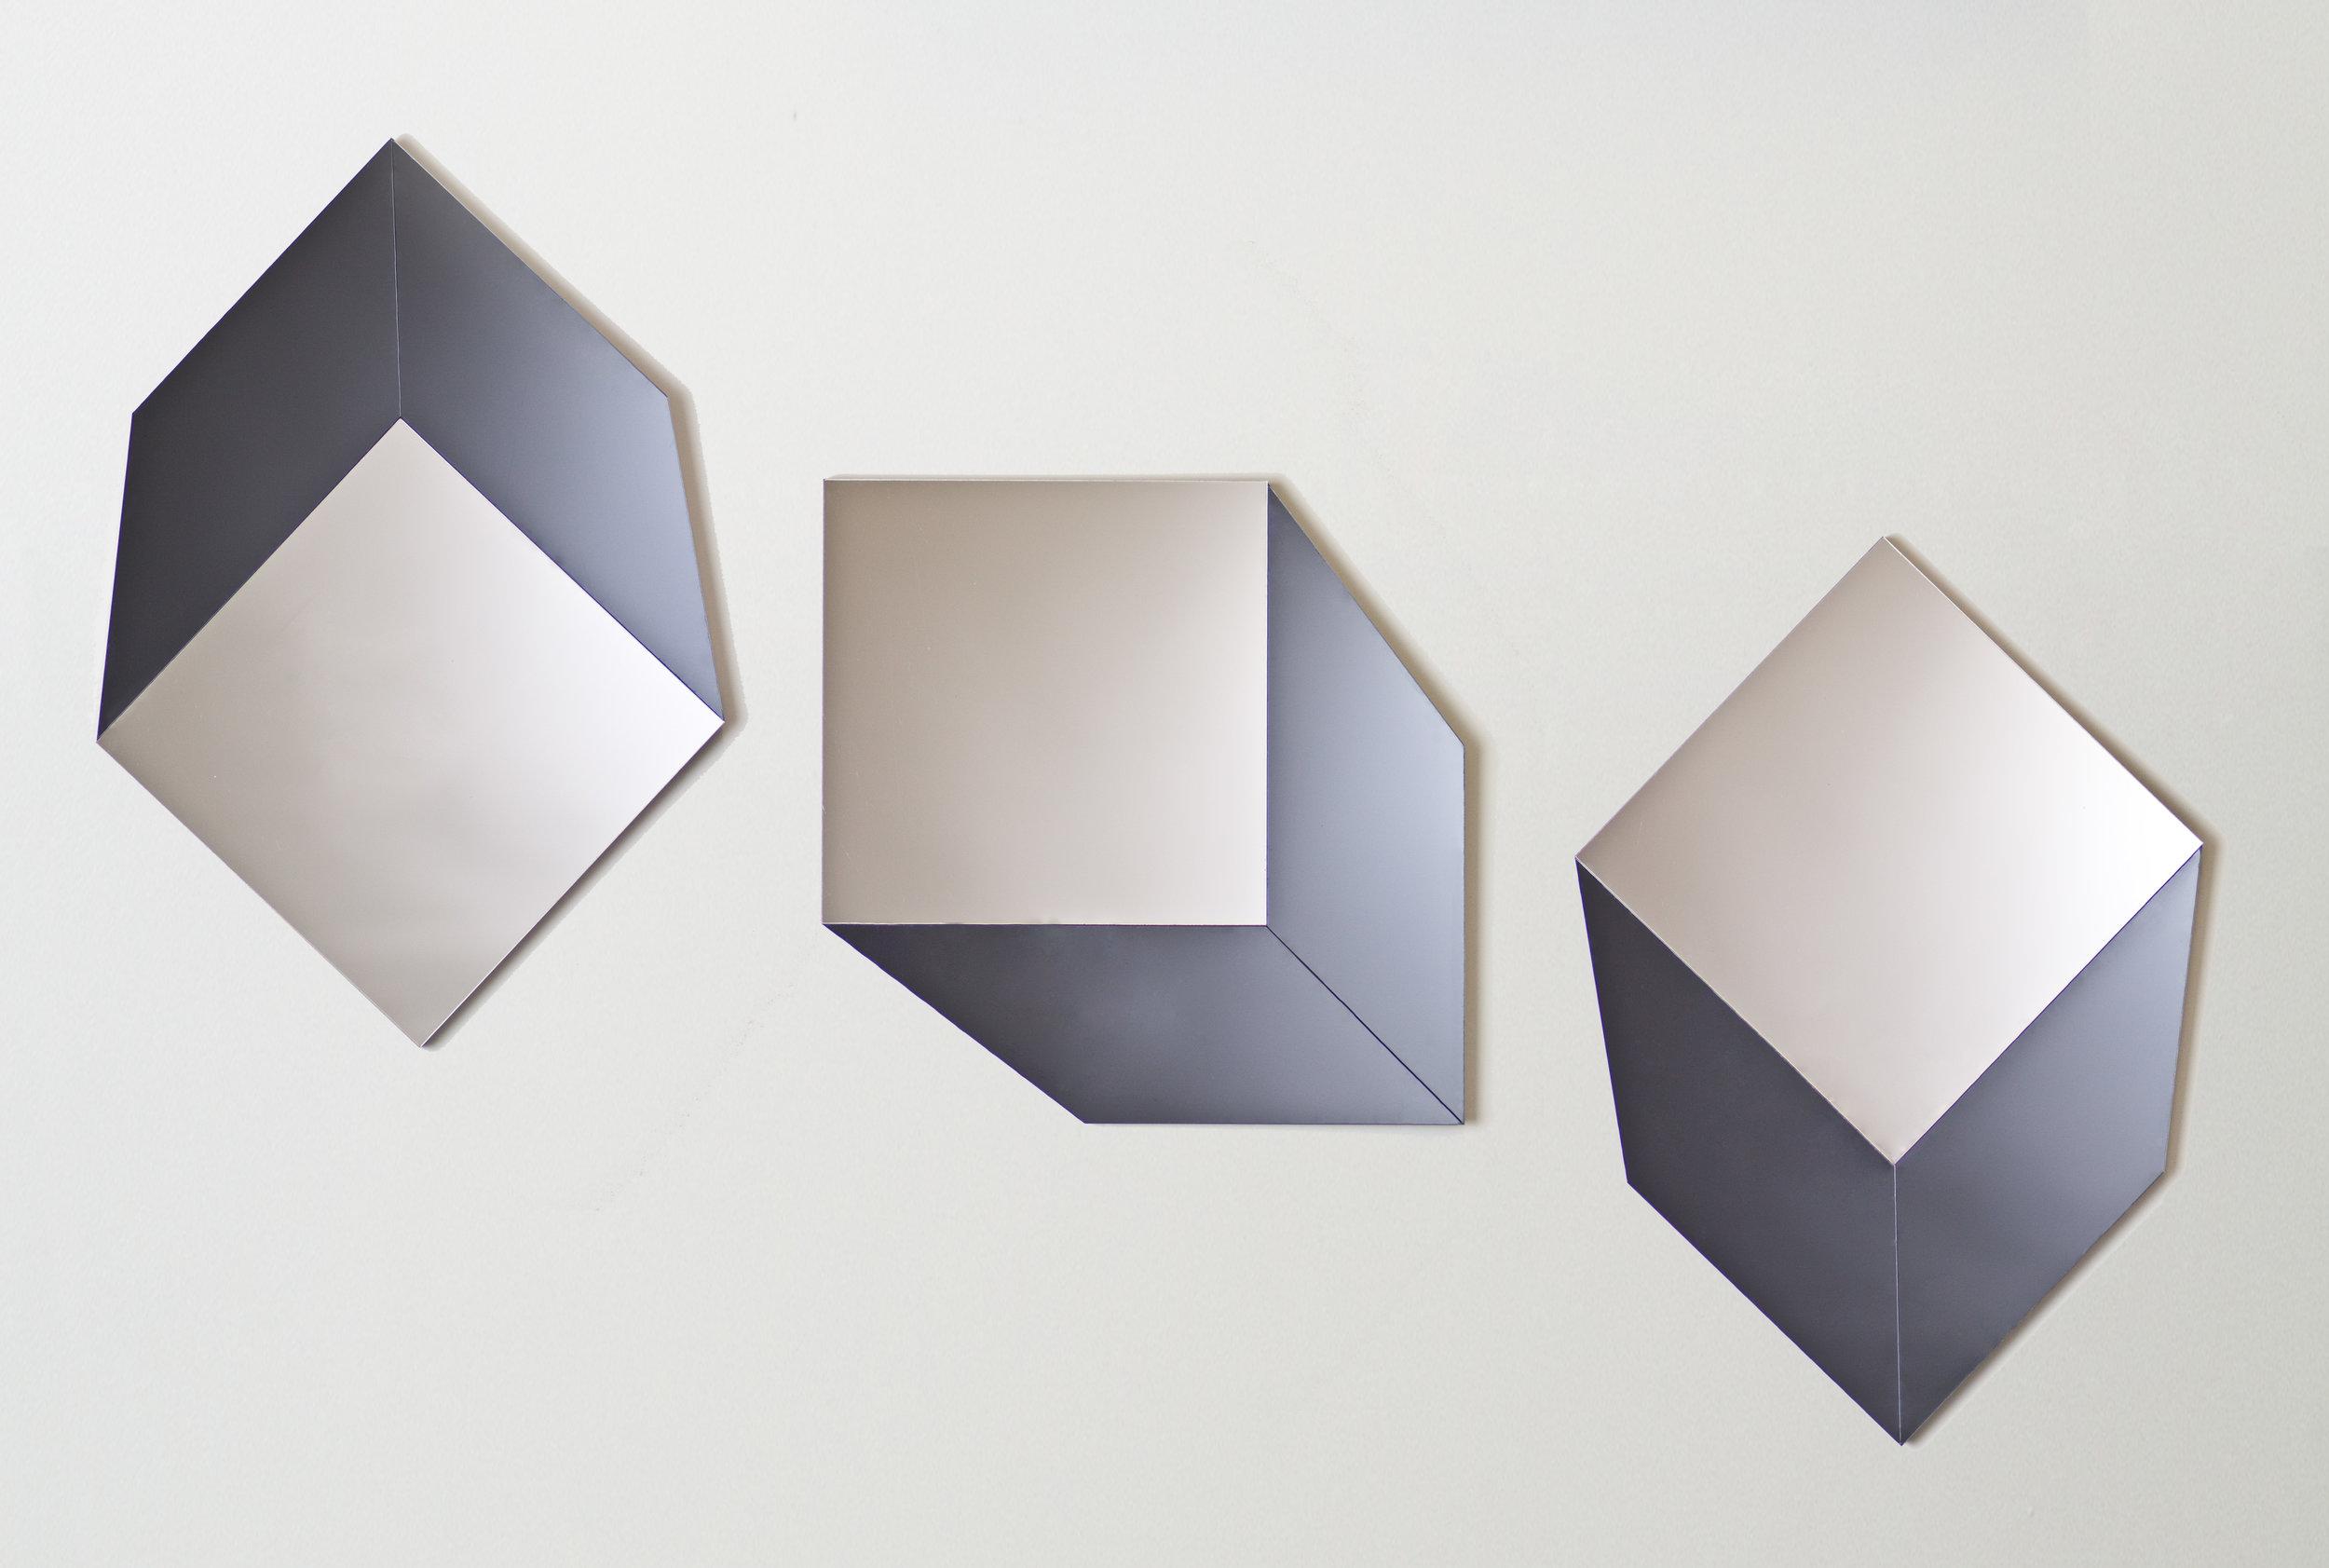 Mirror_Cube_Rotation_haideedrew.jpg